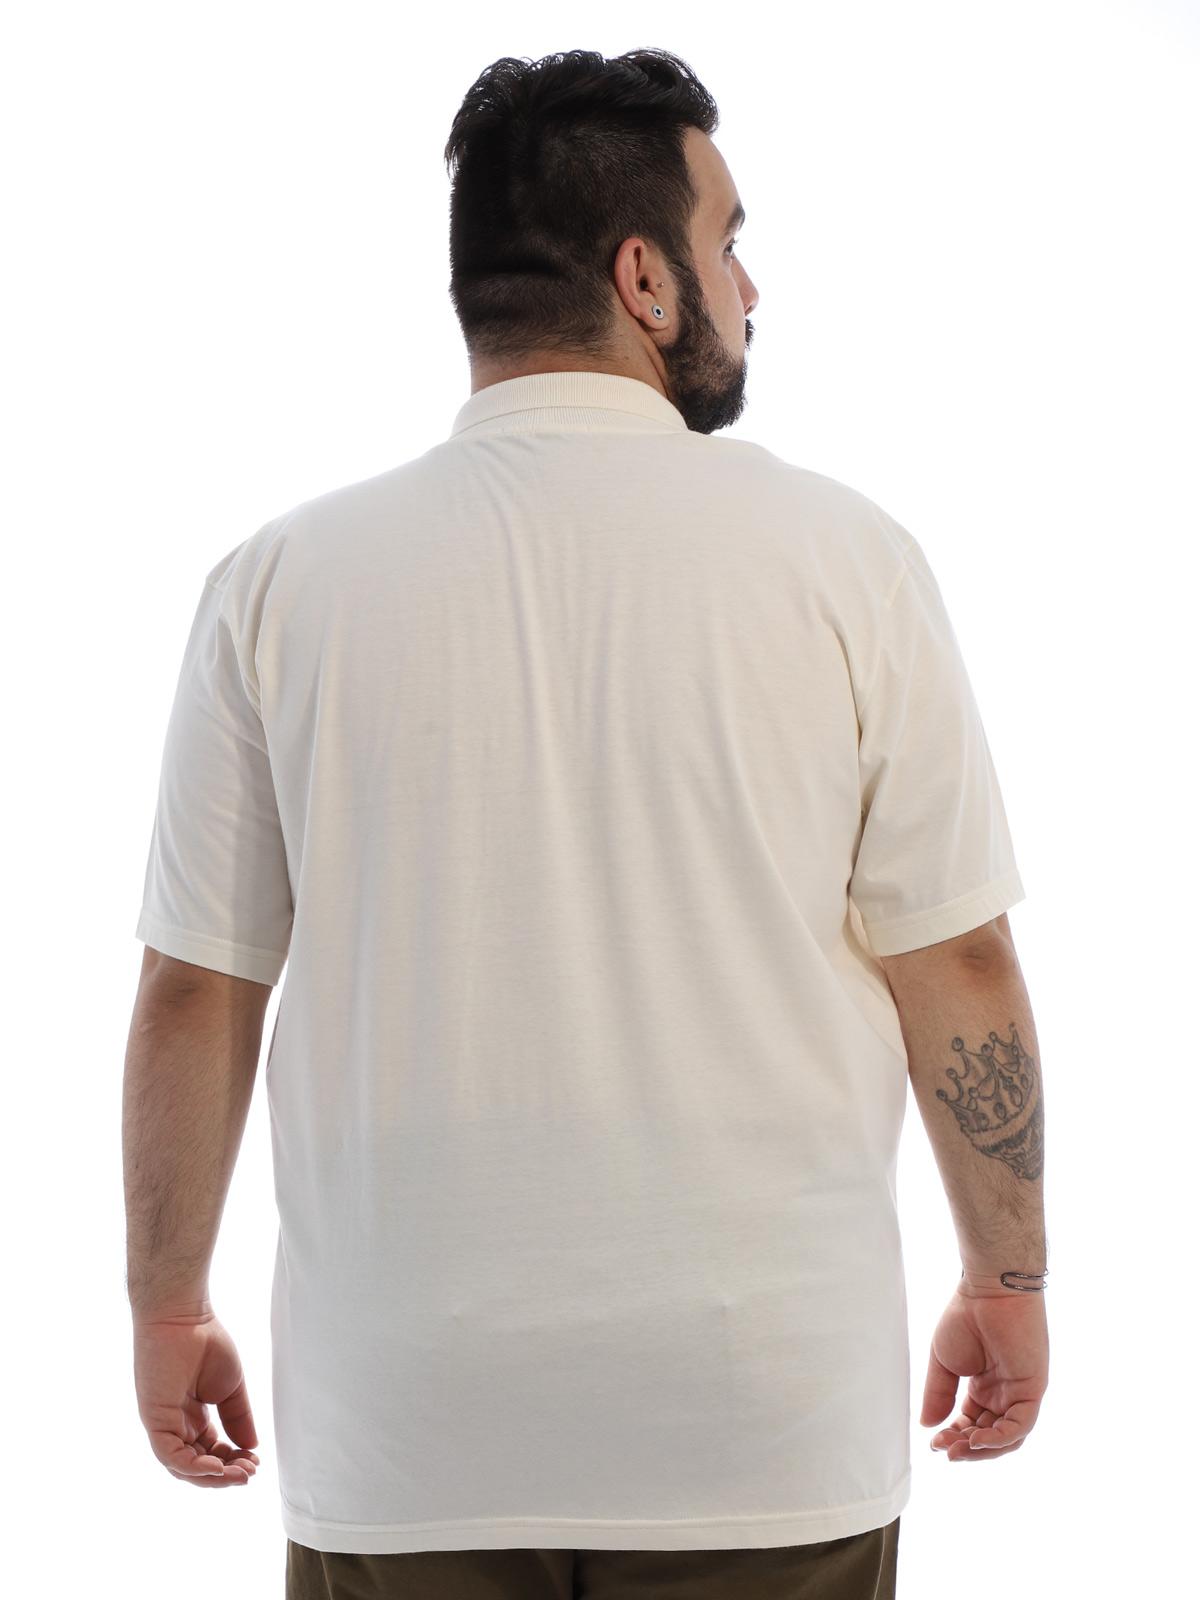 Camisa Polo Plus Size Masculina com Bolso Basica Marfim